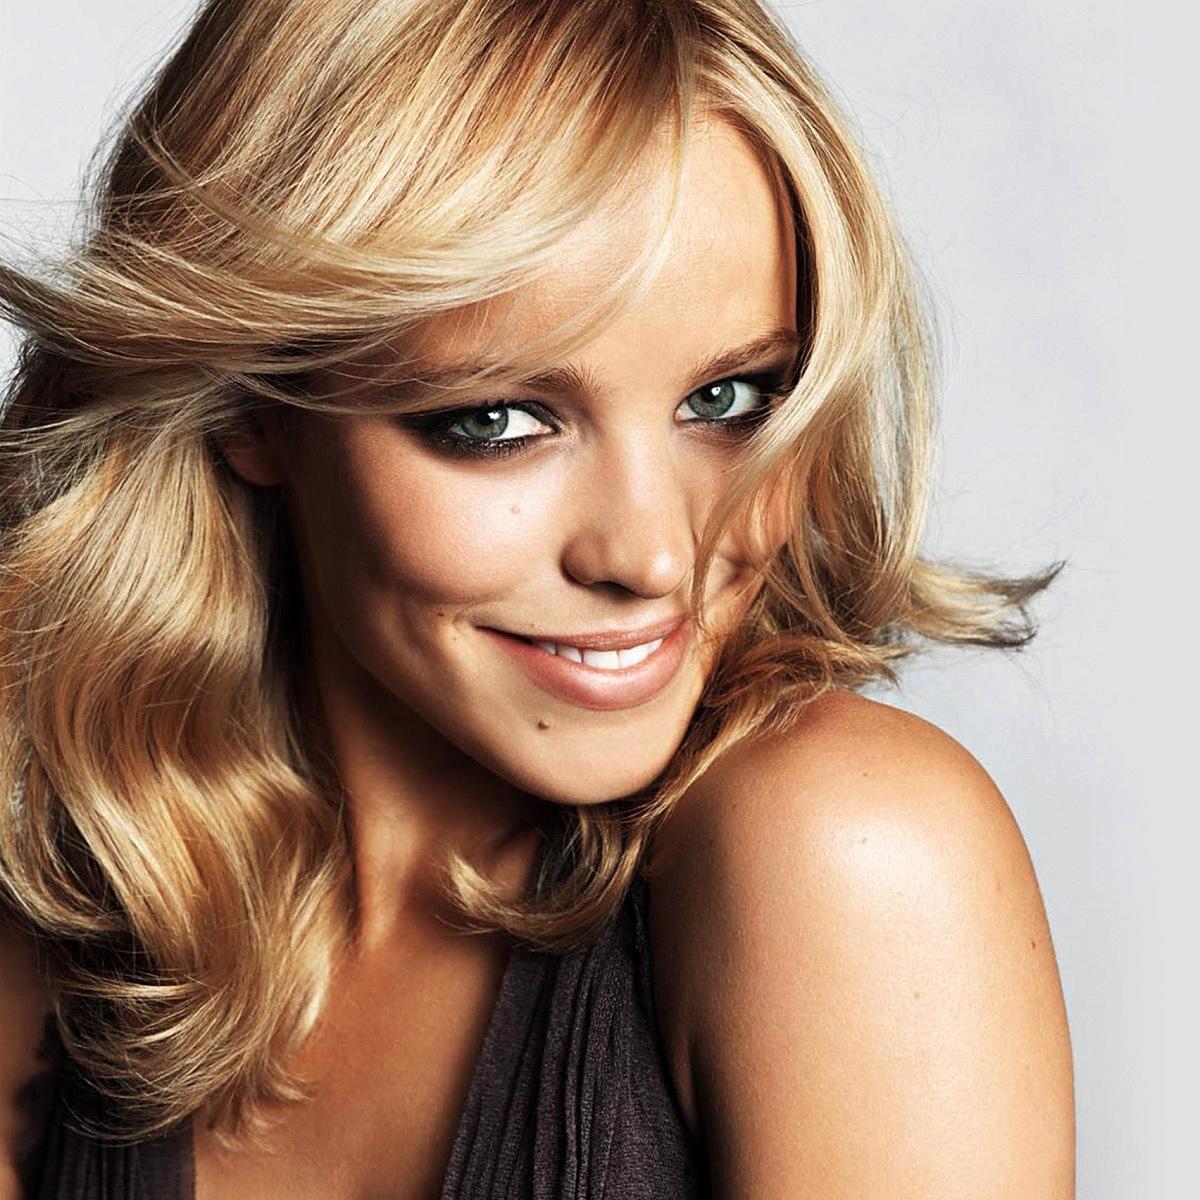 http://2.bp.blogspot.com/-FgJ-sviFHW4/Tz7afkcrWSI/AAAAAAAAHZQ/EWd-gaRVh-I/s1600/Rachel+Mcadams+Hairstyle+Pictures+12.jpg